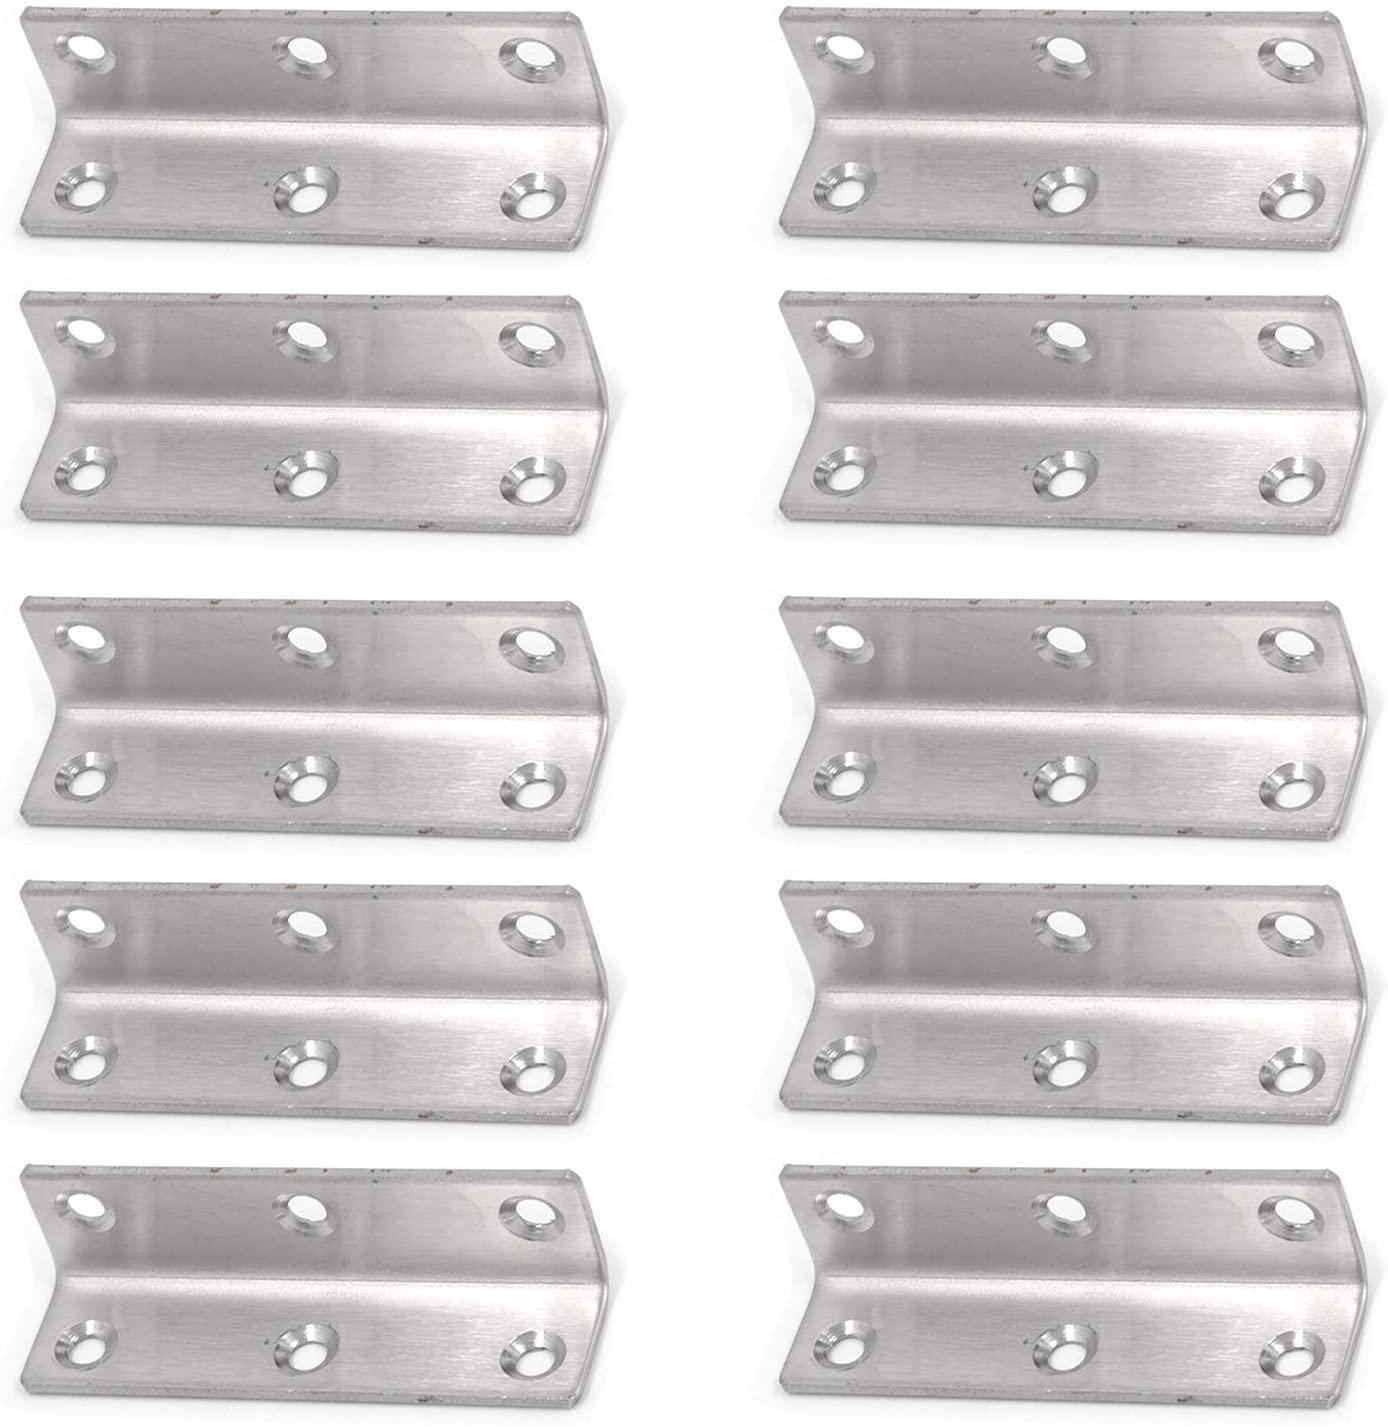 Geesatis 10 Pcs Right Angle Corner Brace Bracket Connector L Shaped Support Shelf Bracket Door Window Corner Brackets with Mounting Screws, 3 x 0.8 inch / 80 x 20mm, Silver